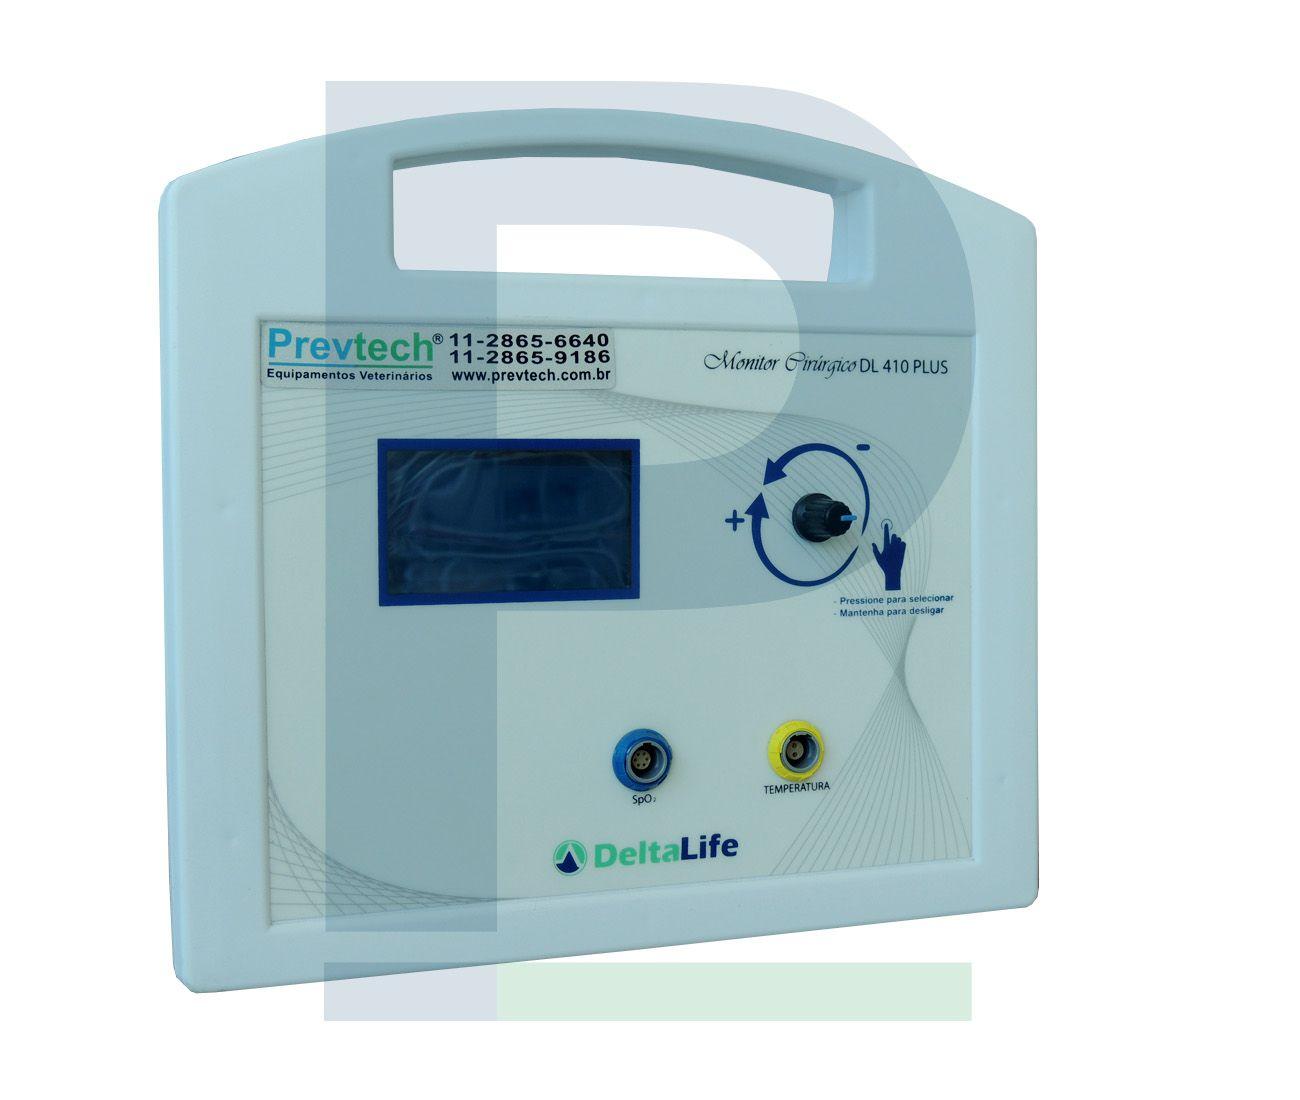 K - Monitor Veterinário Cirúrgico - DL 410 Plus